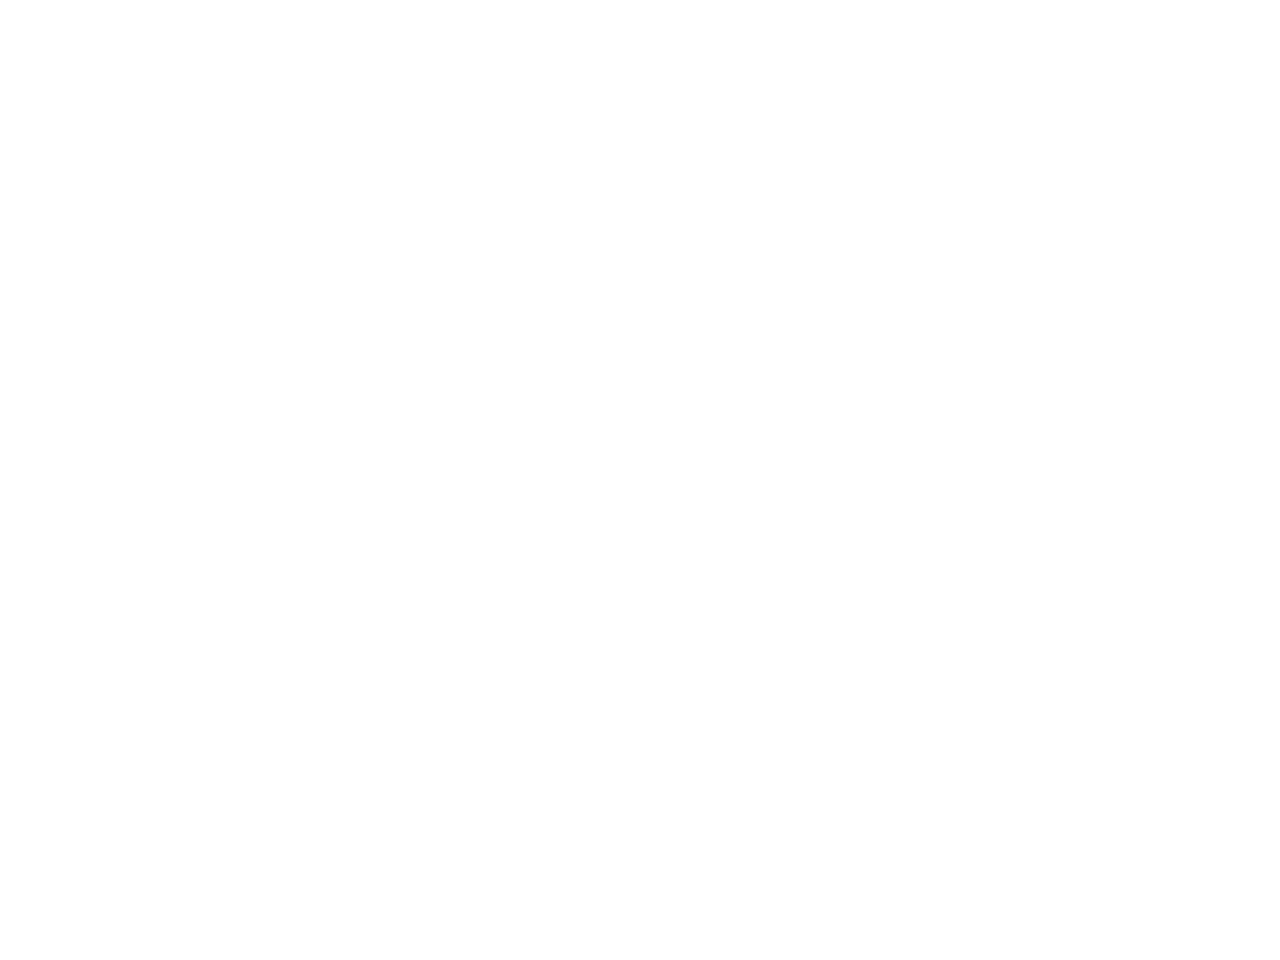 David A. Yovanno Joins Marin Software as New CEO